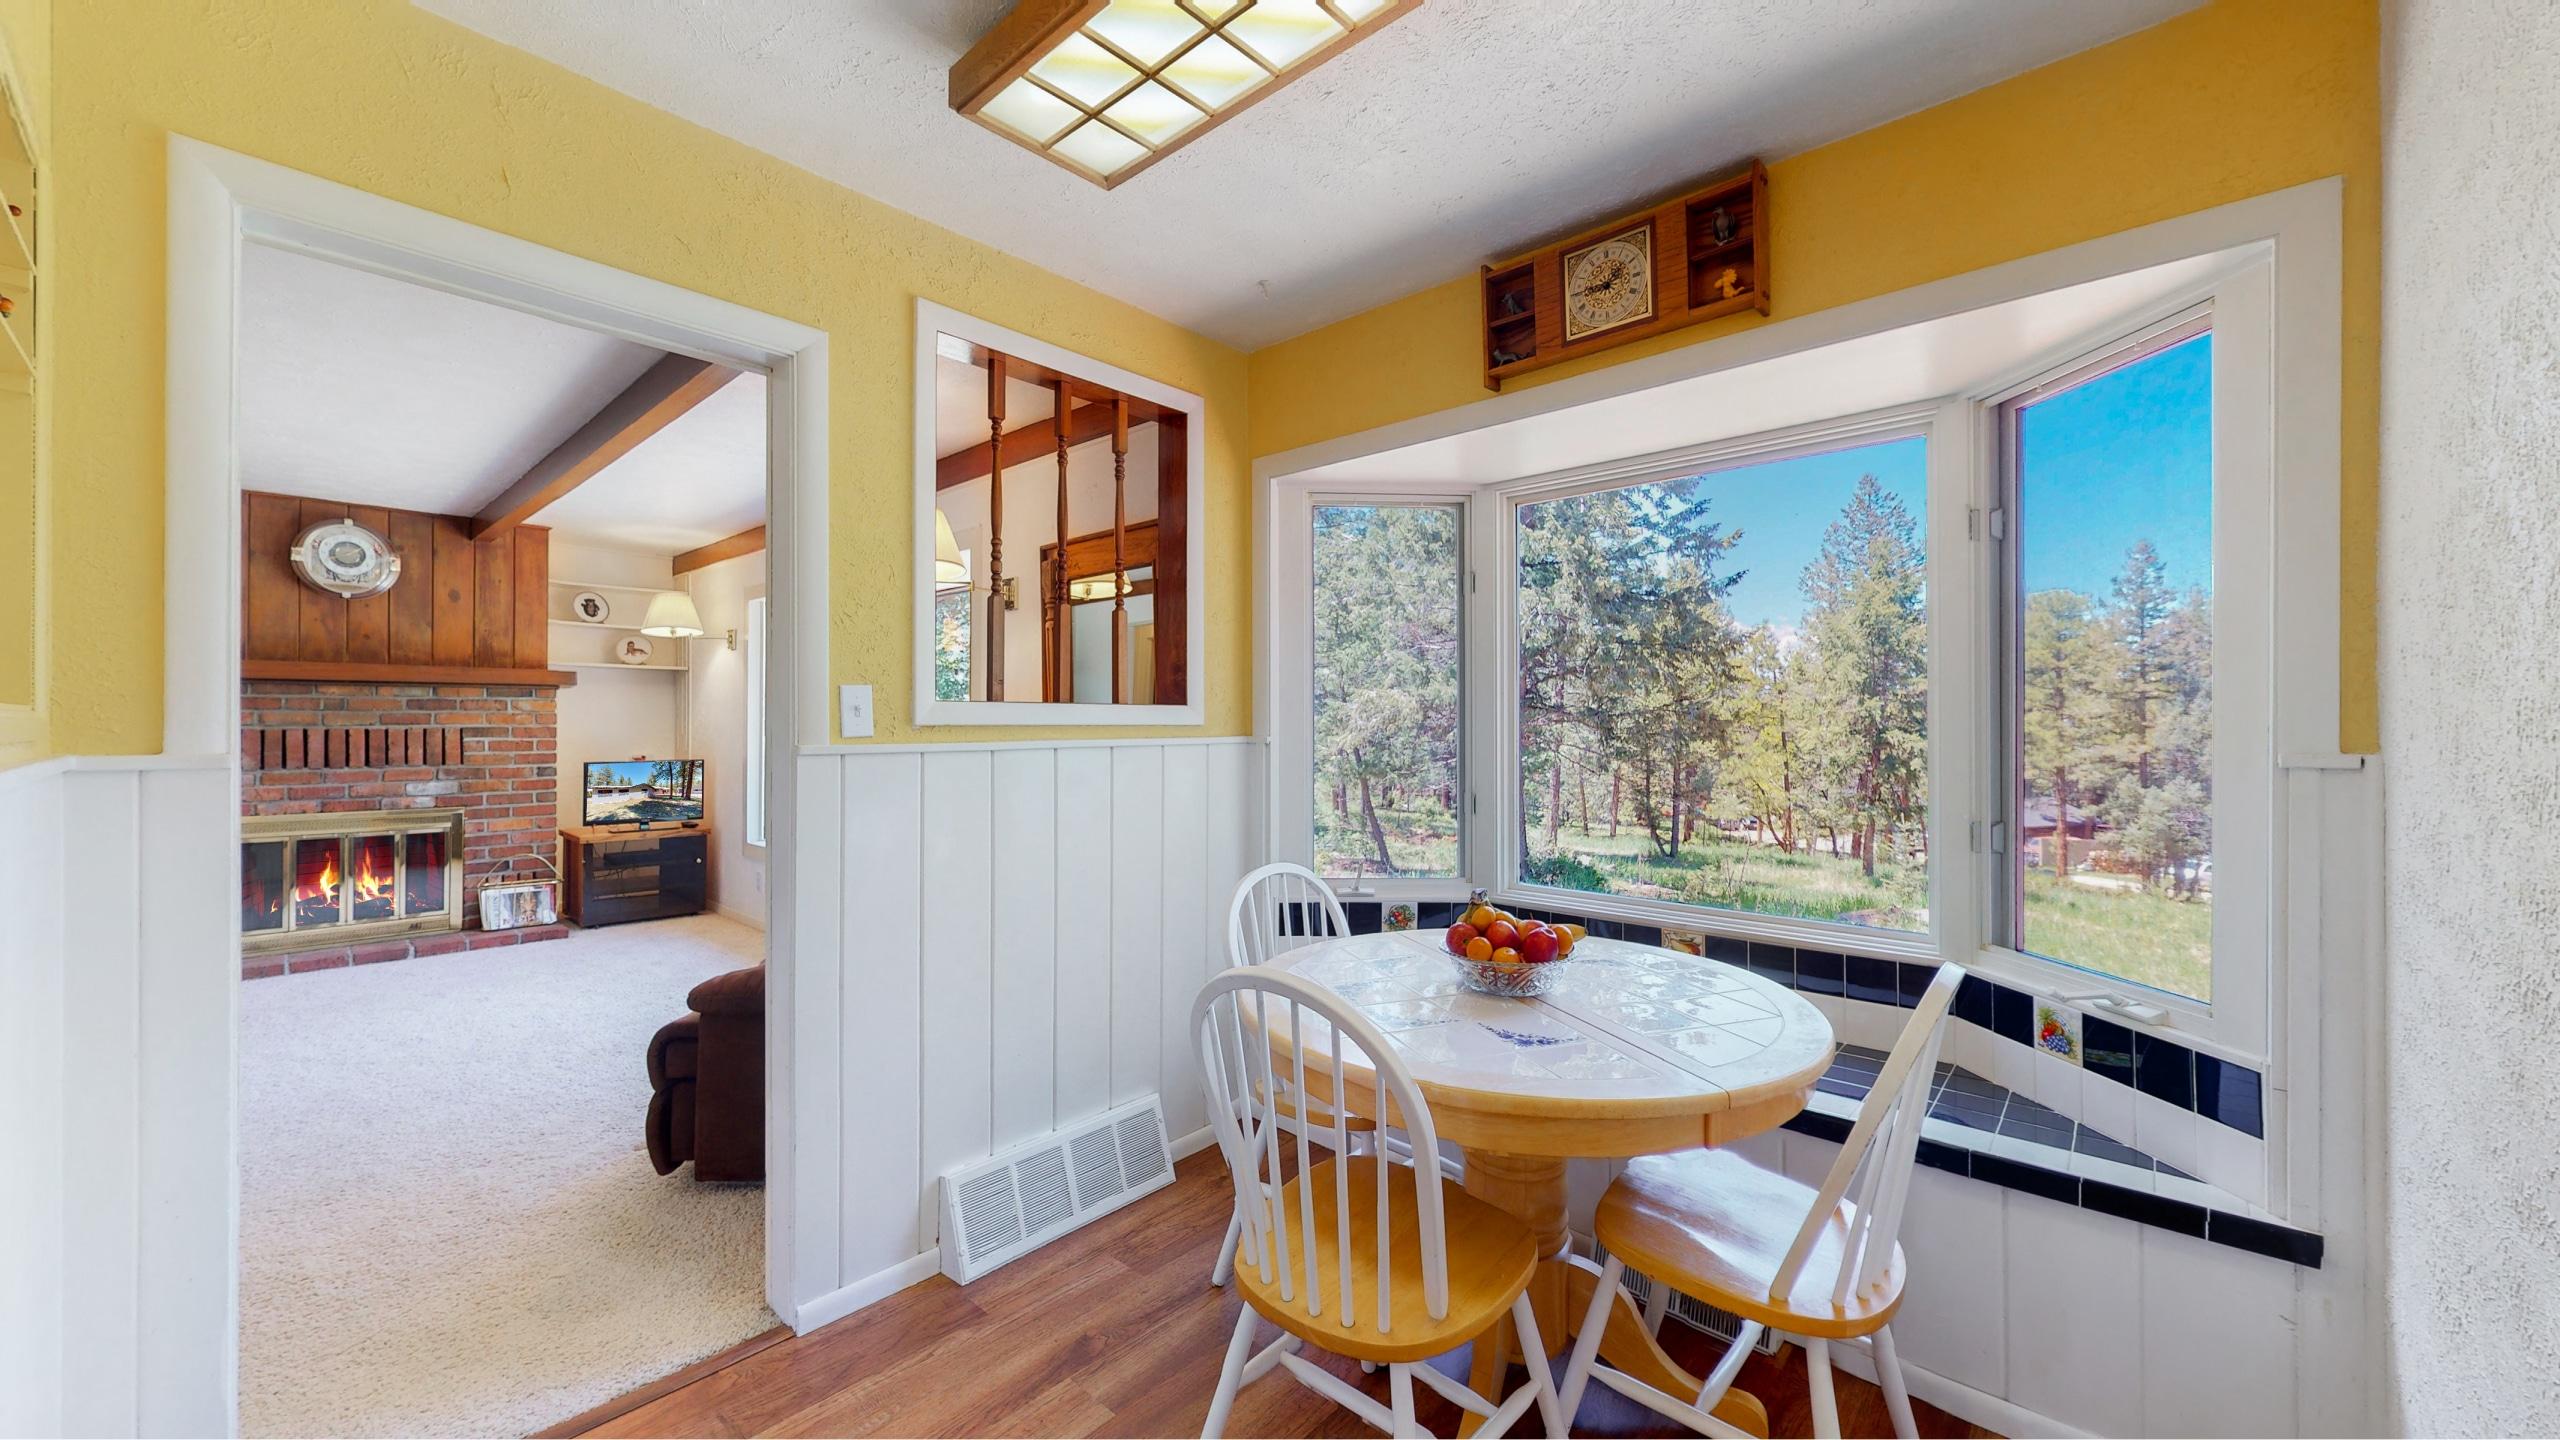 Dining room with big bay windows to watch wildlife